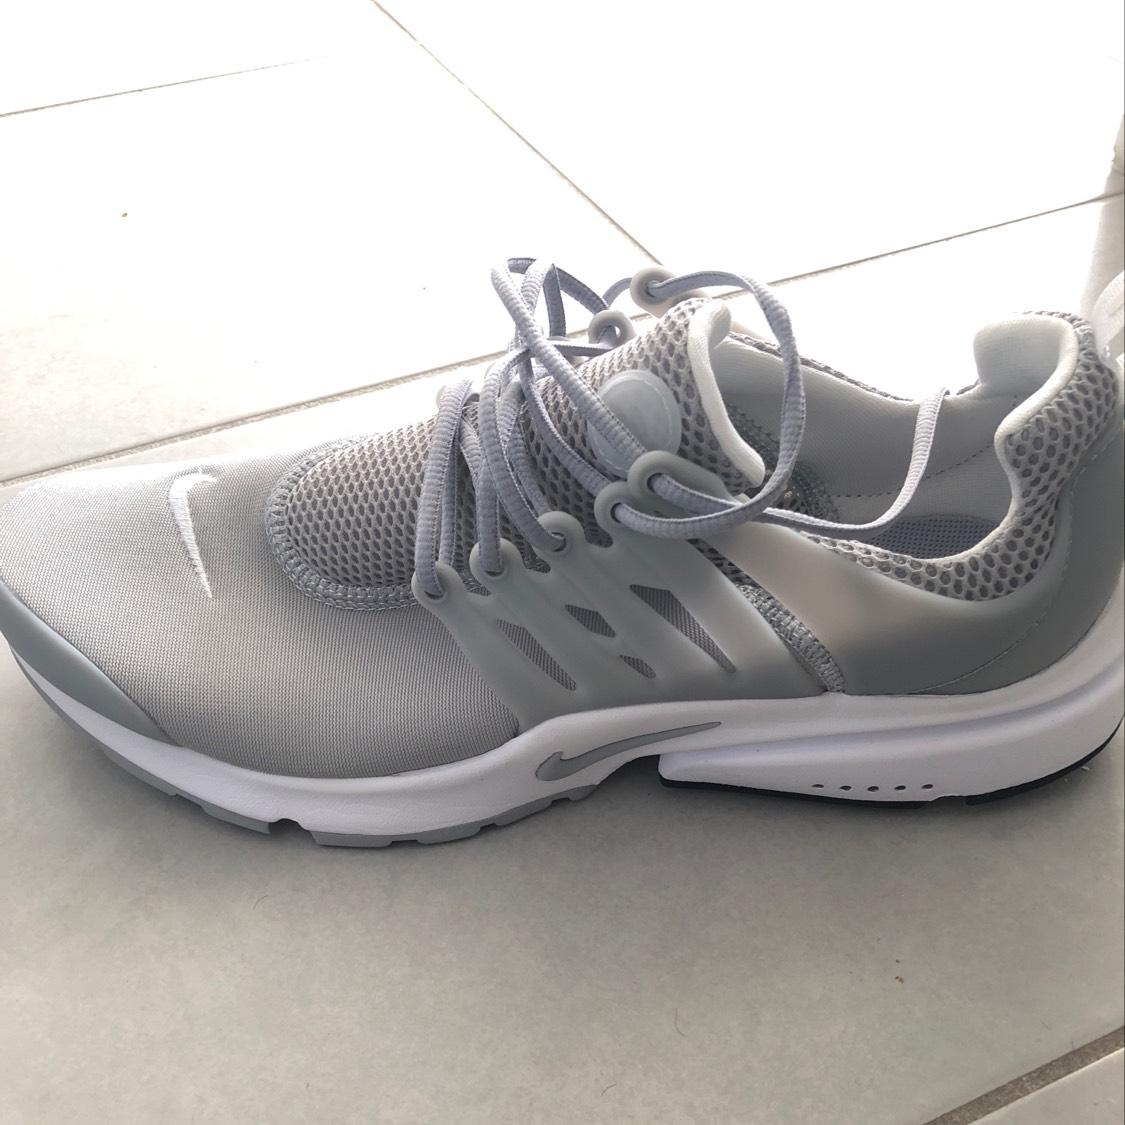 Chaussures Nike Presto - McArthurGlen Provence, Miramas (13)